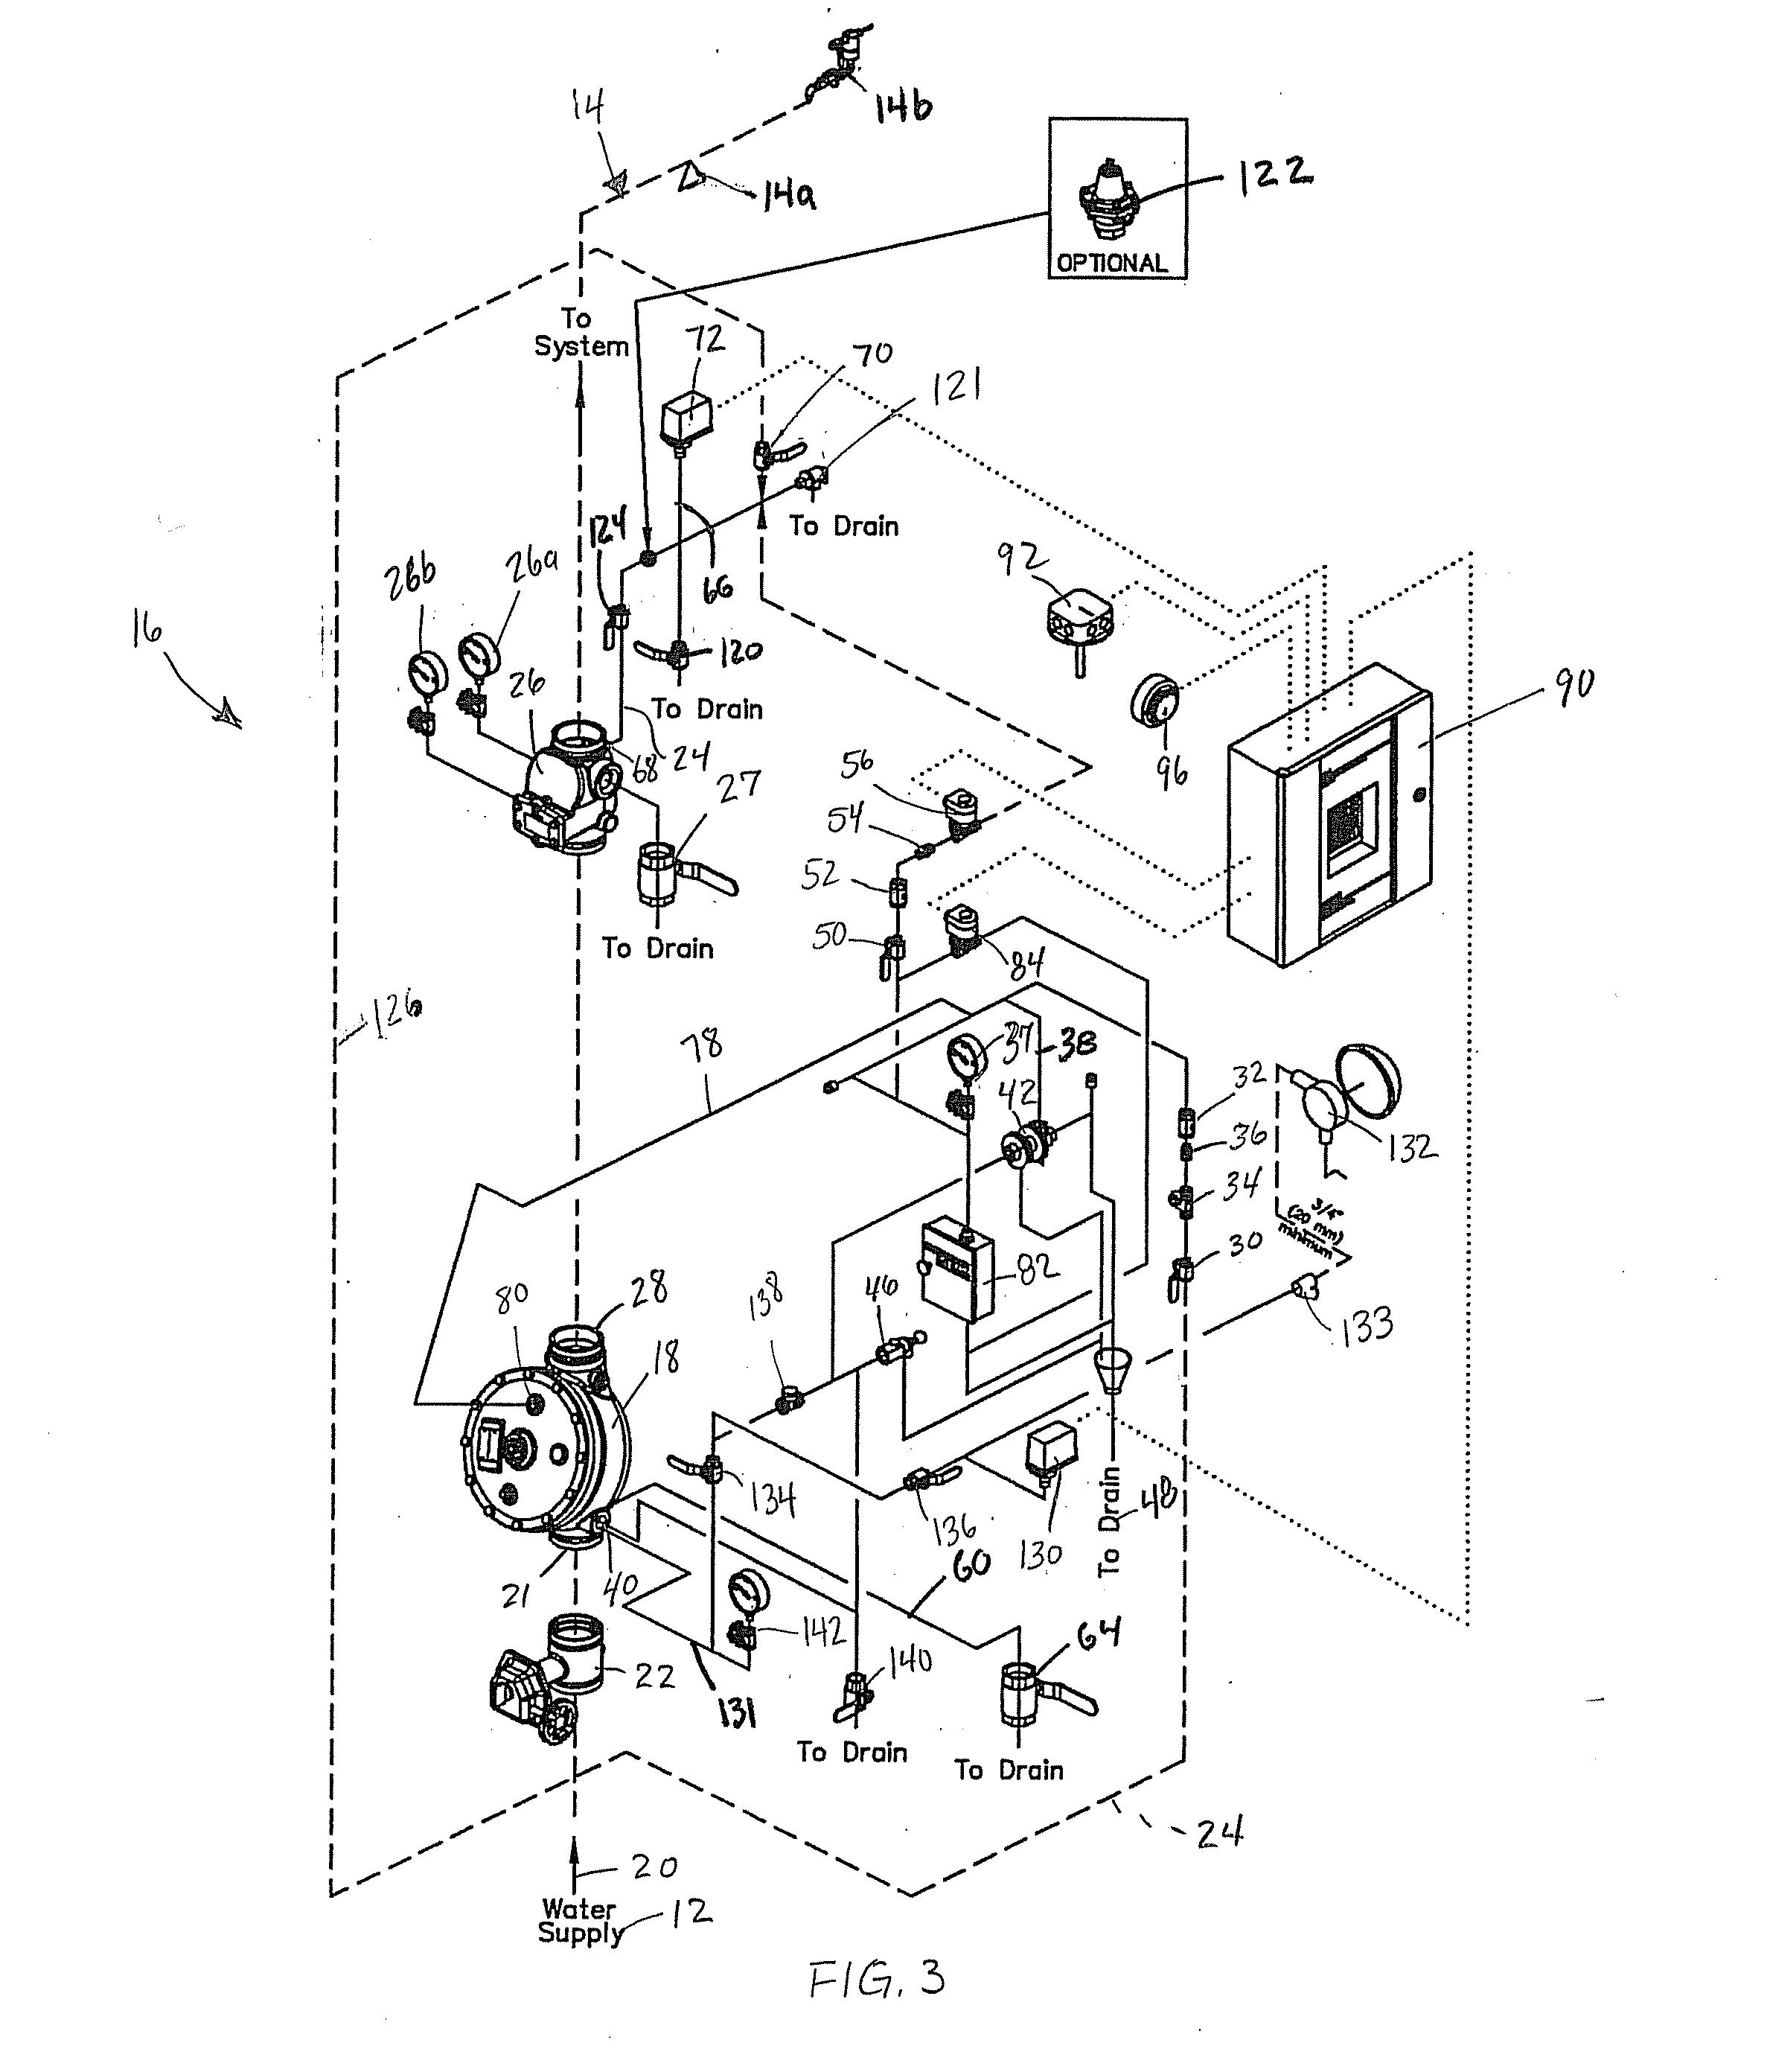 Patent US Pre primed Preaction Sprinkler System